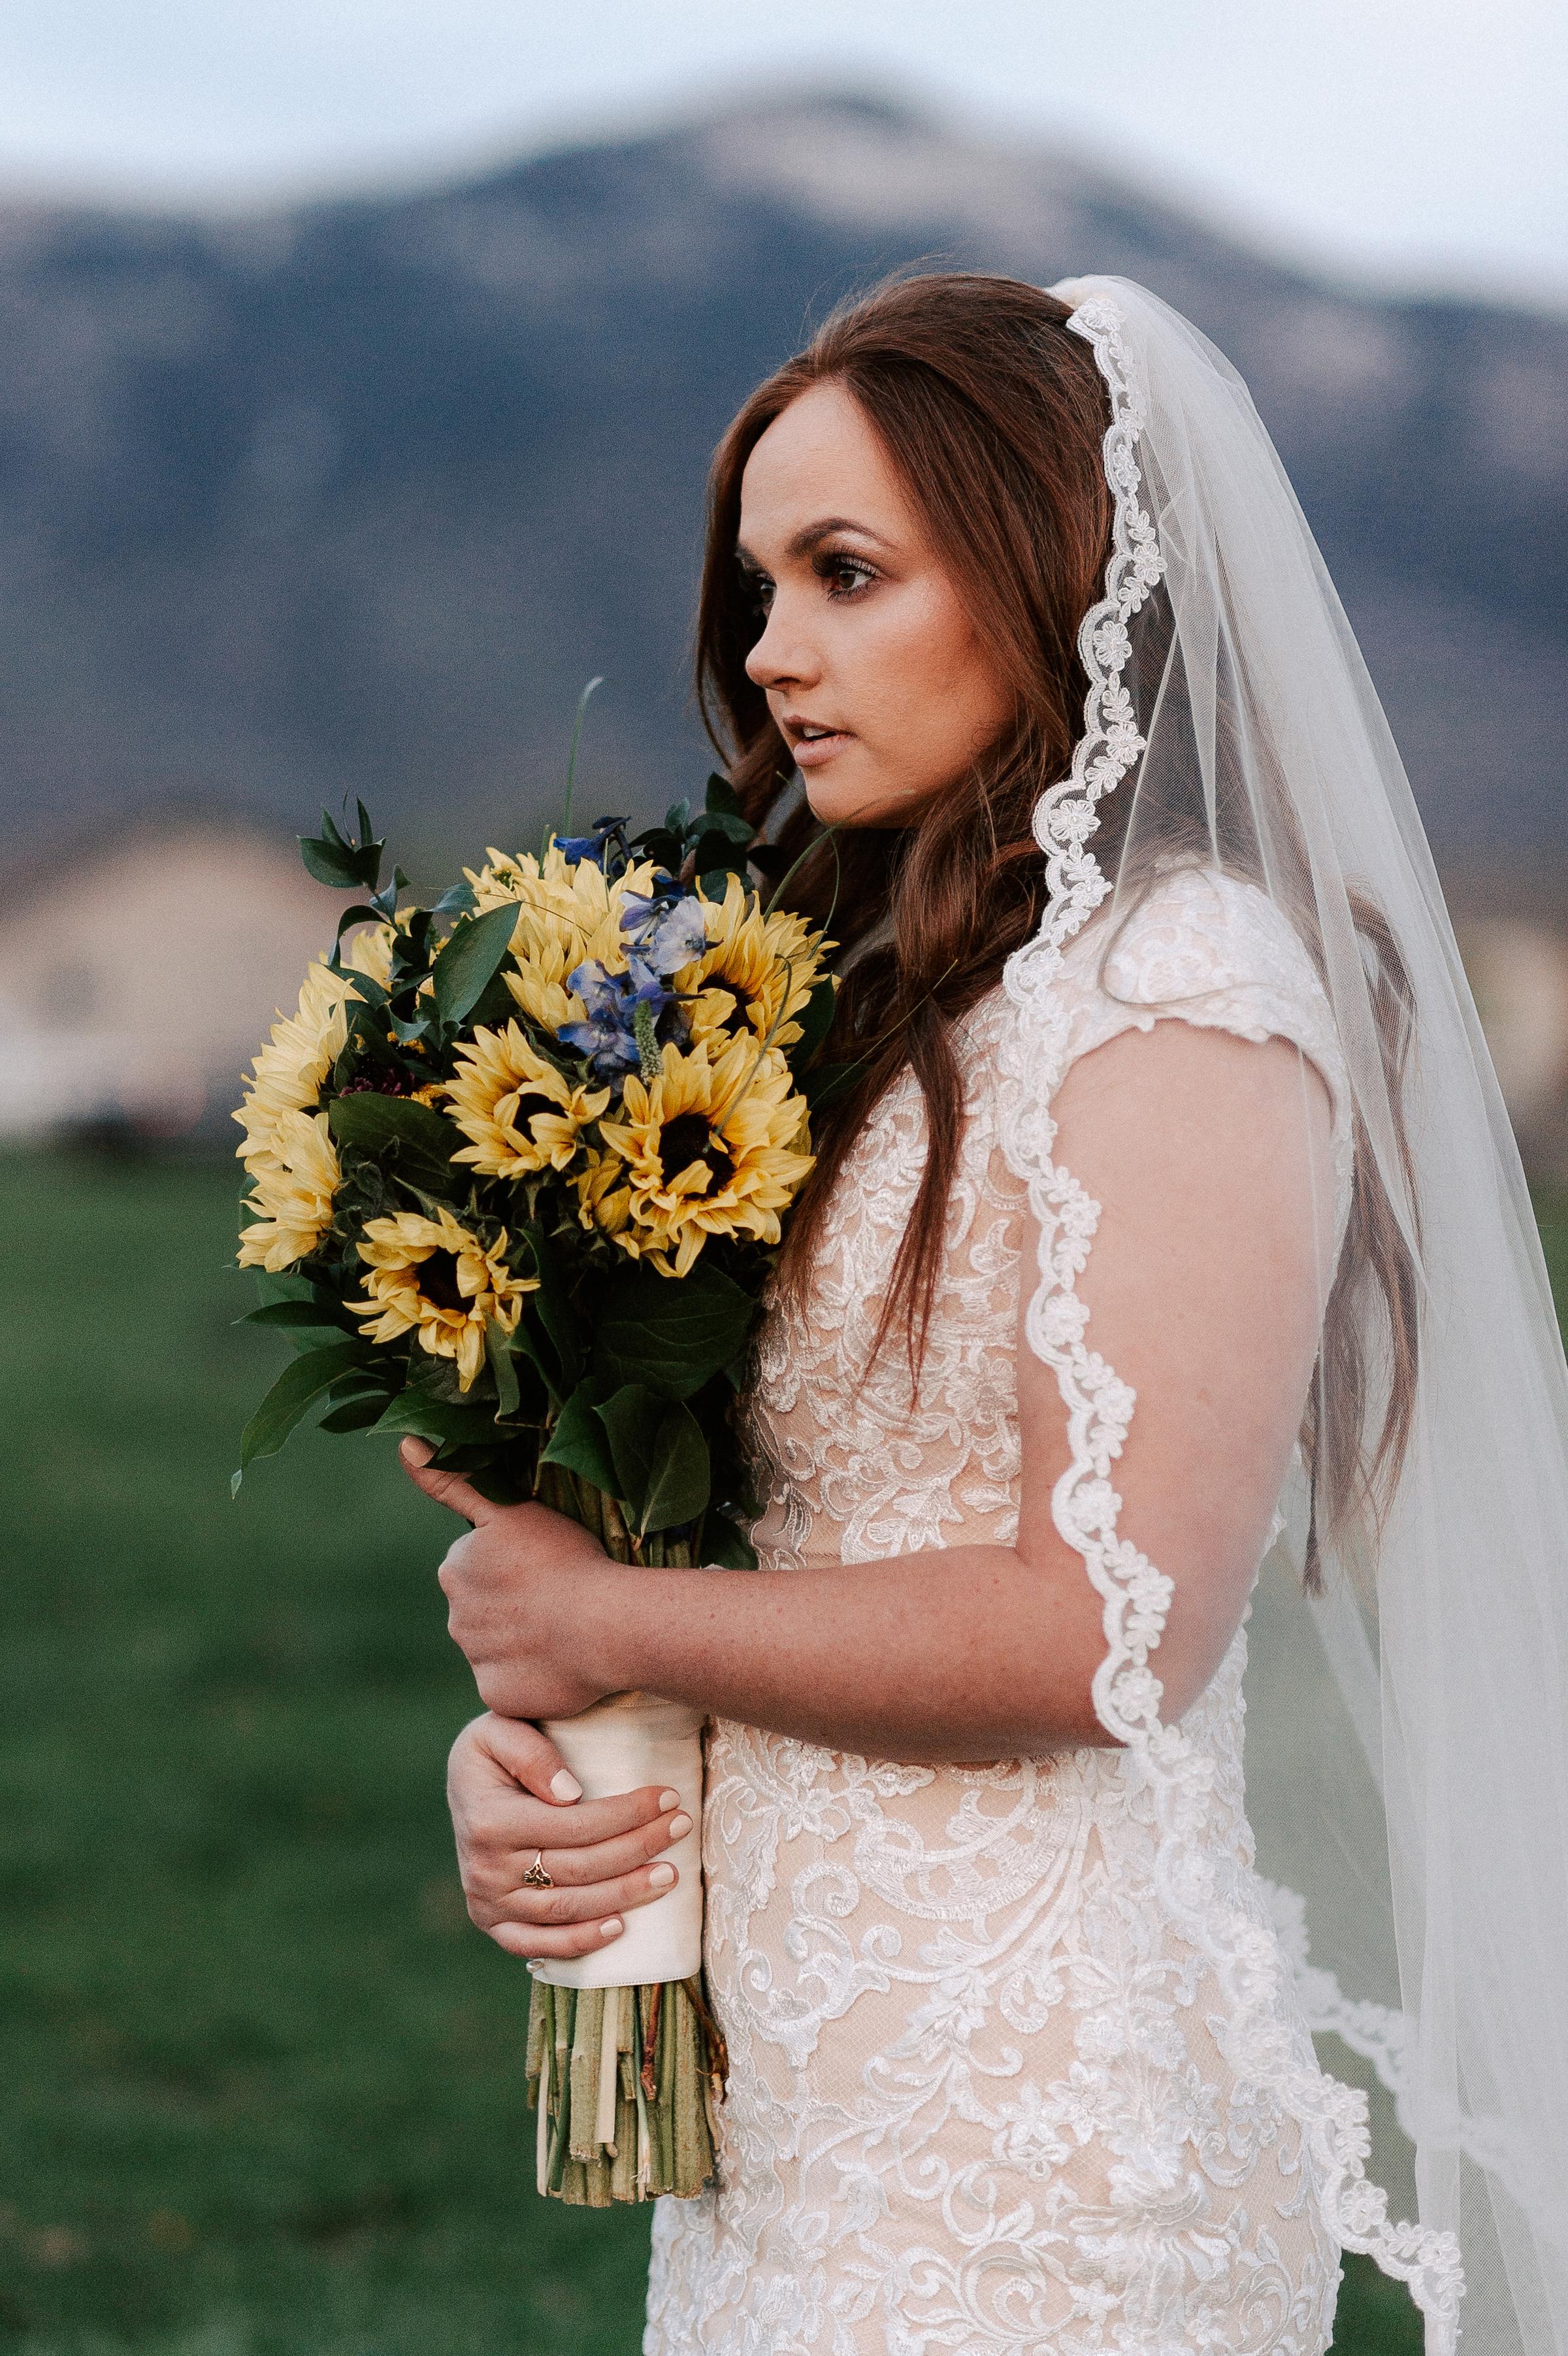 Sunflower Wedding Bouquet Ranch Tew Treasures Photography 2